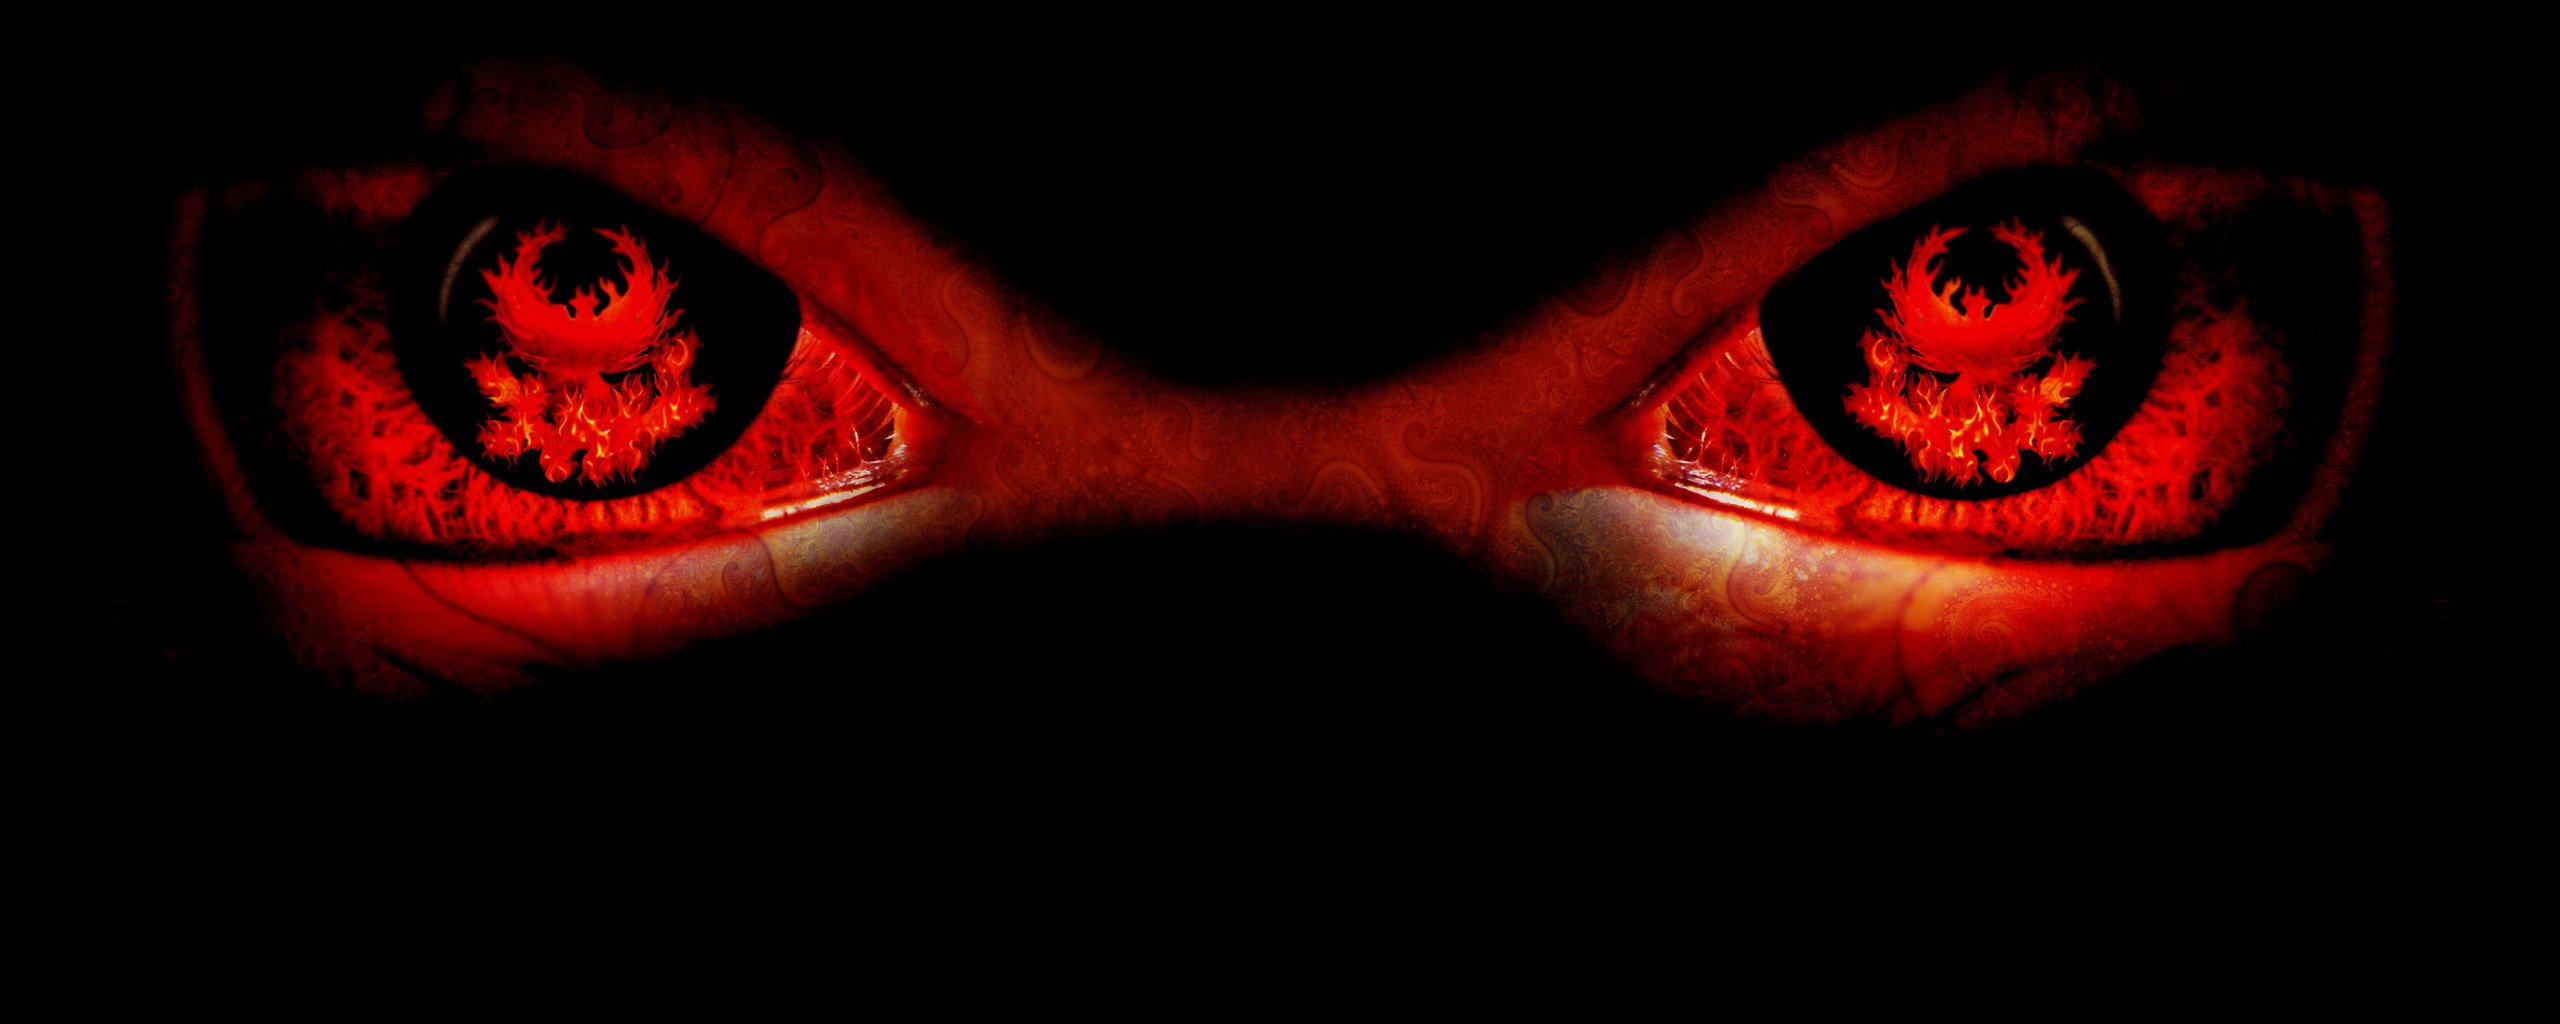 Evil Eyes by Luton 2560x1024